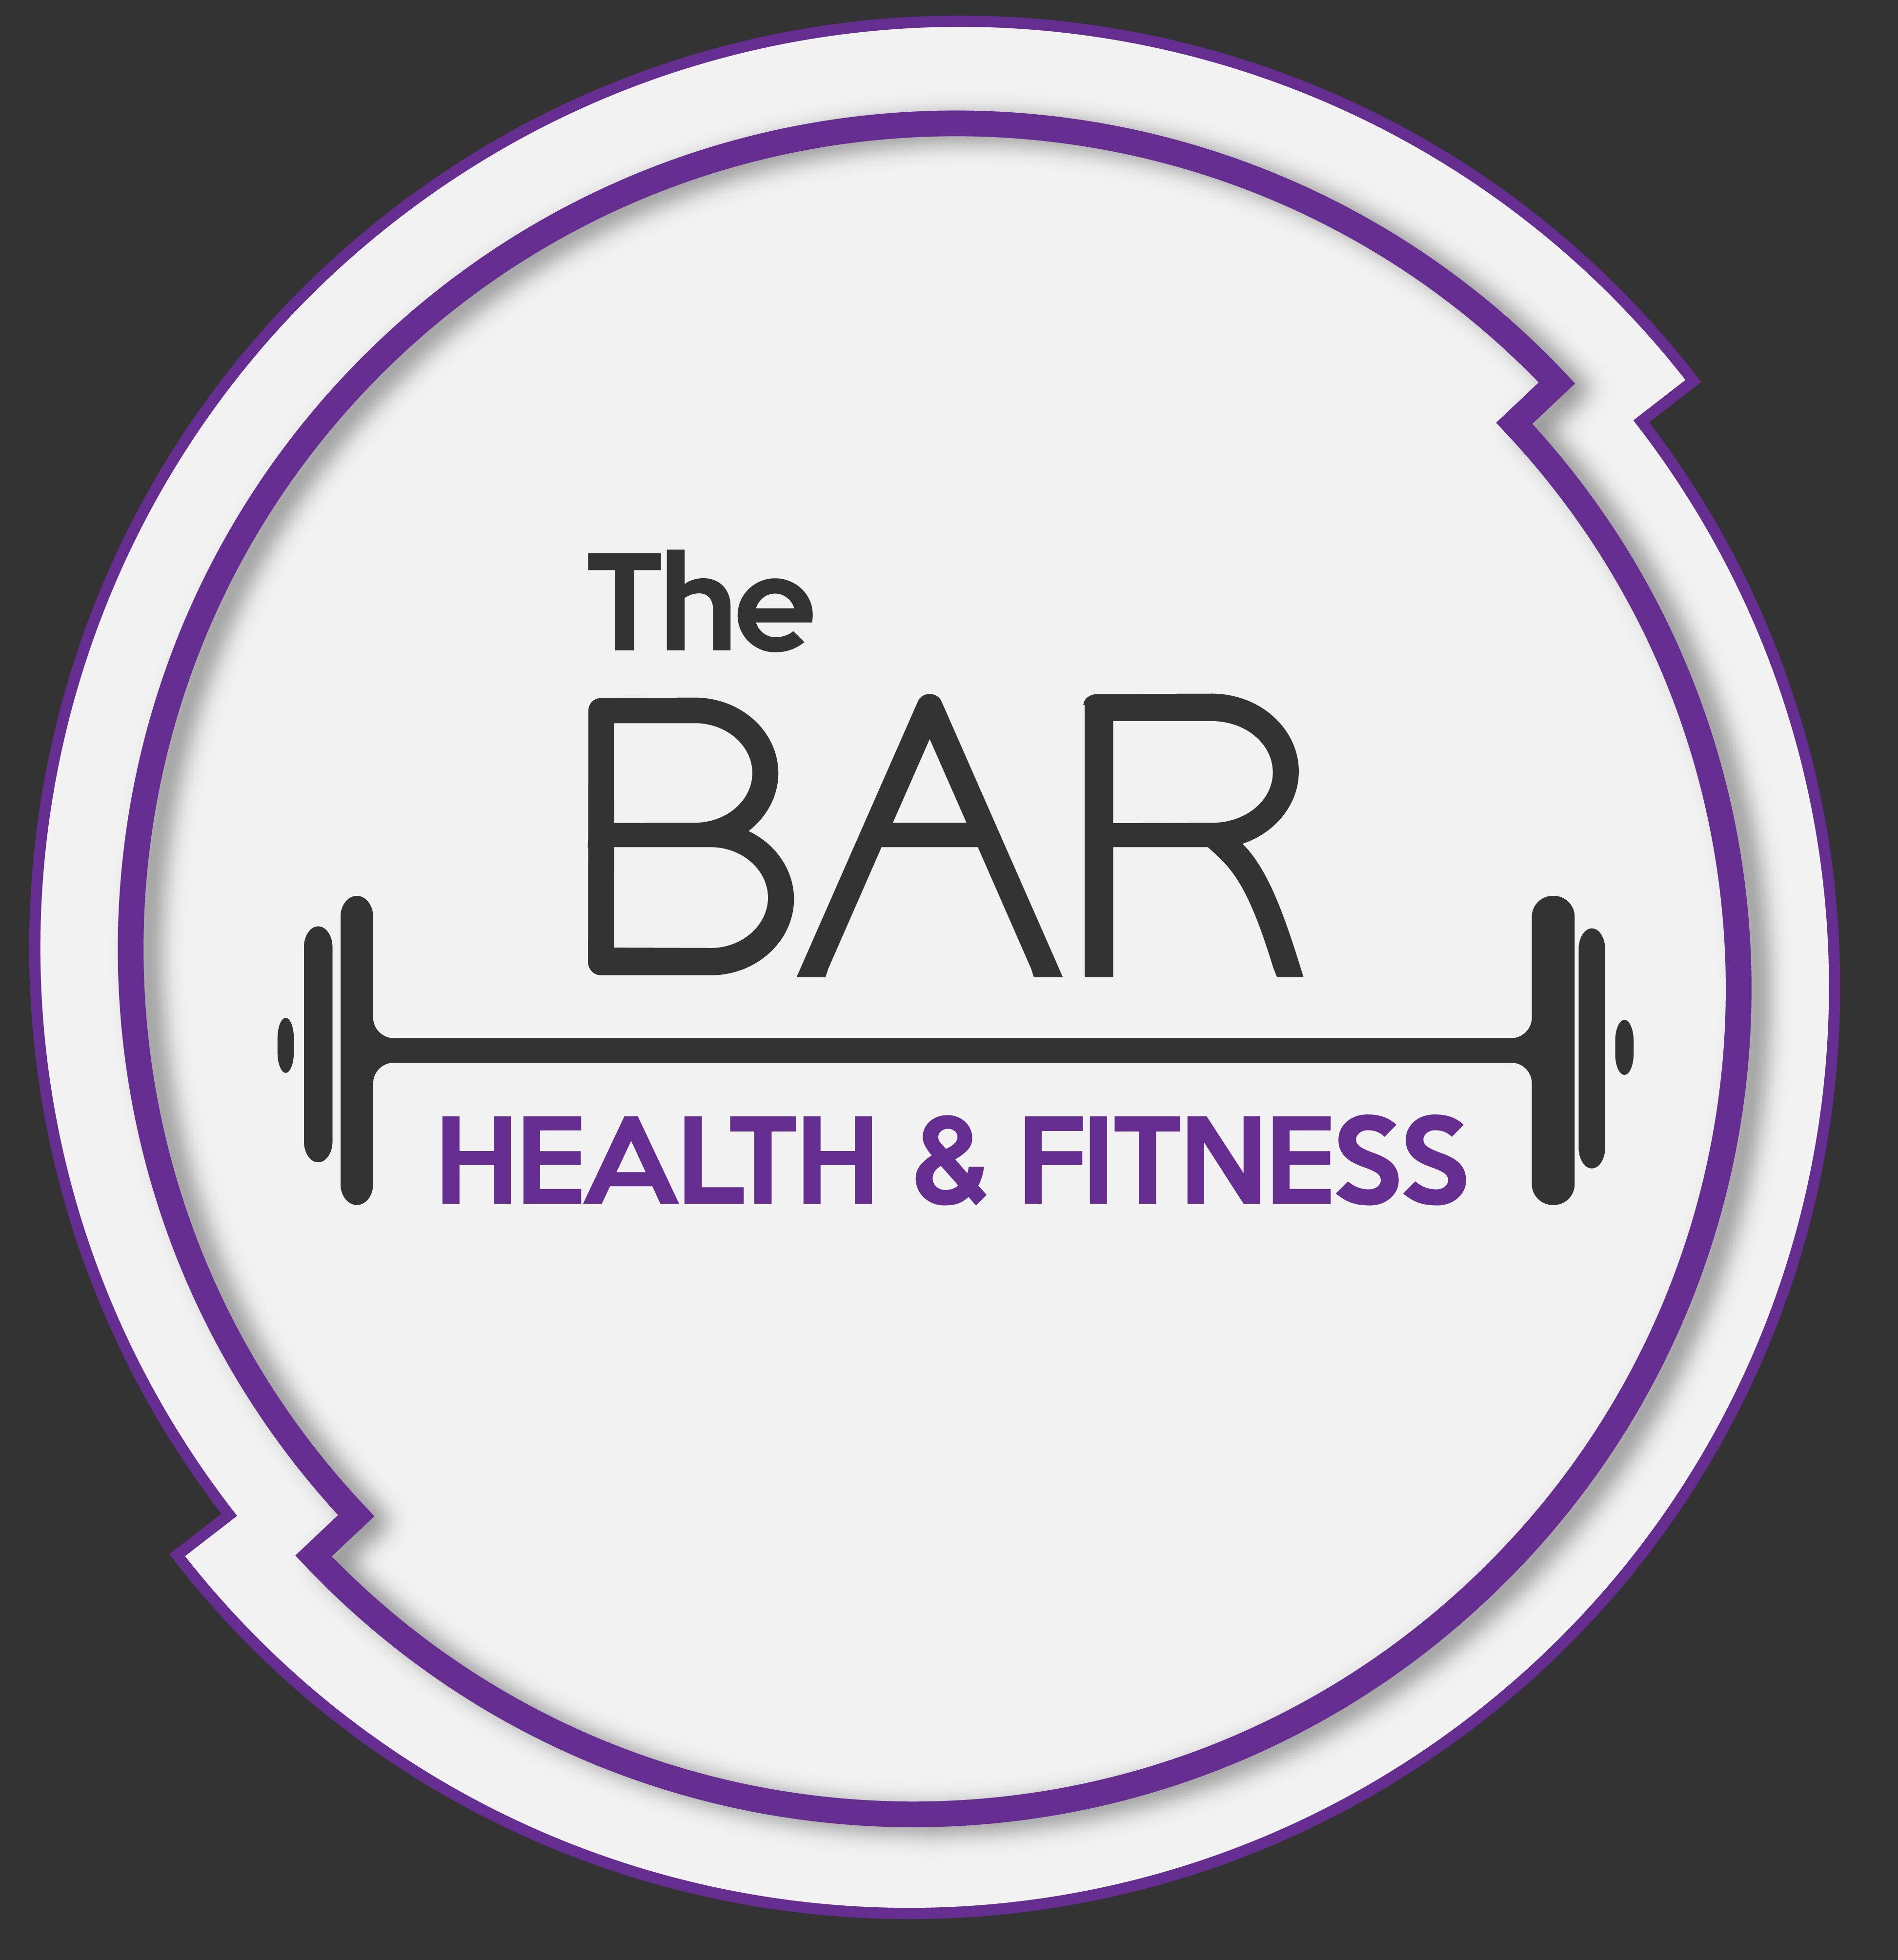 THE BAR HEALTH & FITNESS